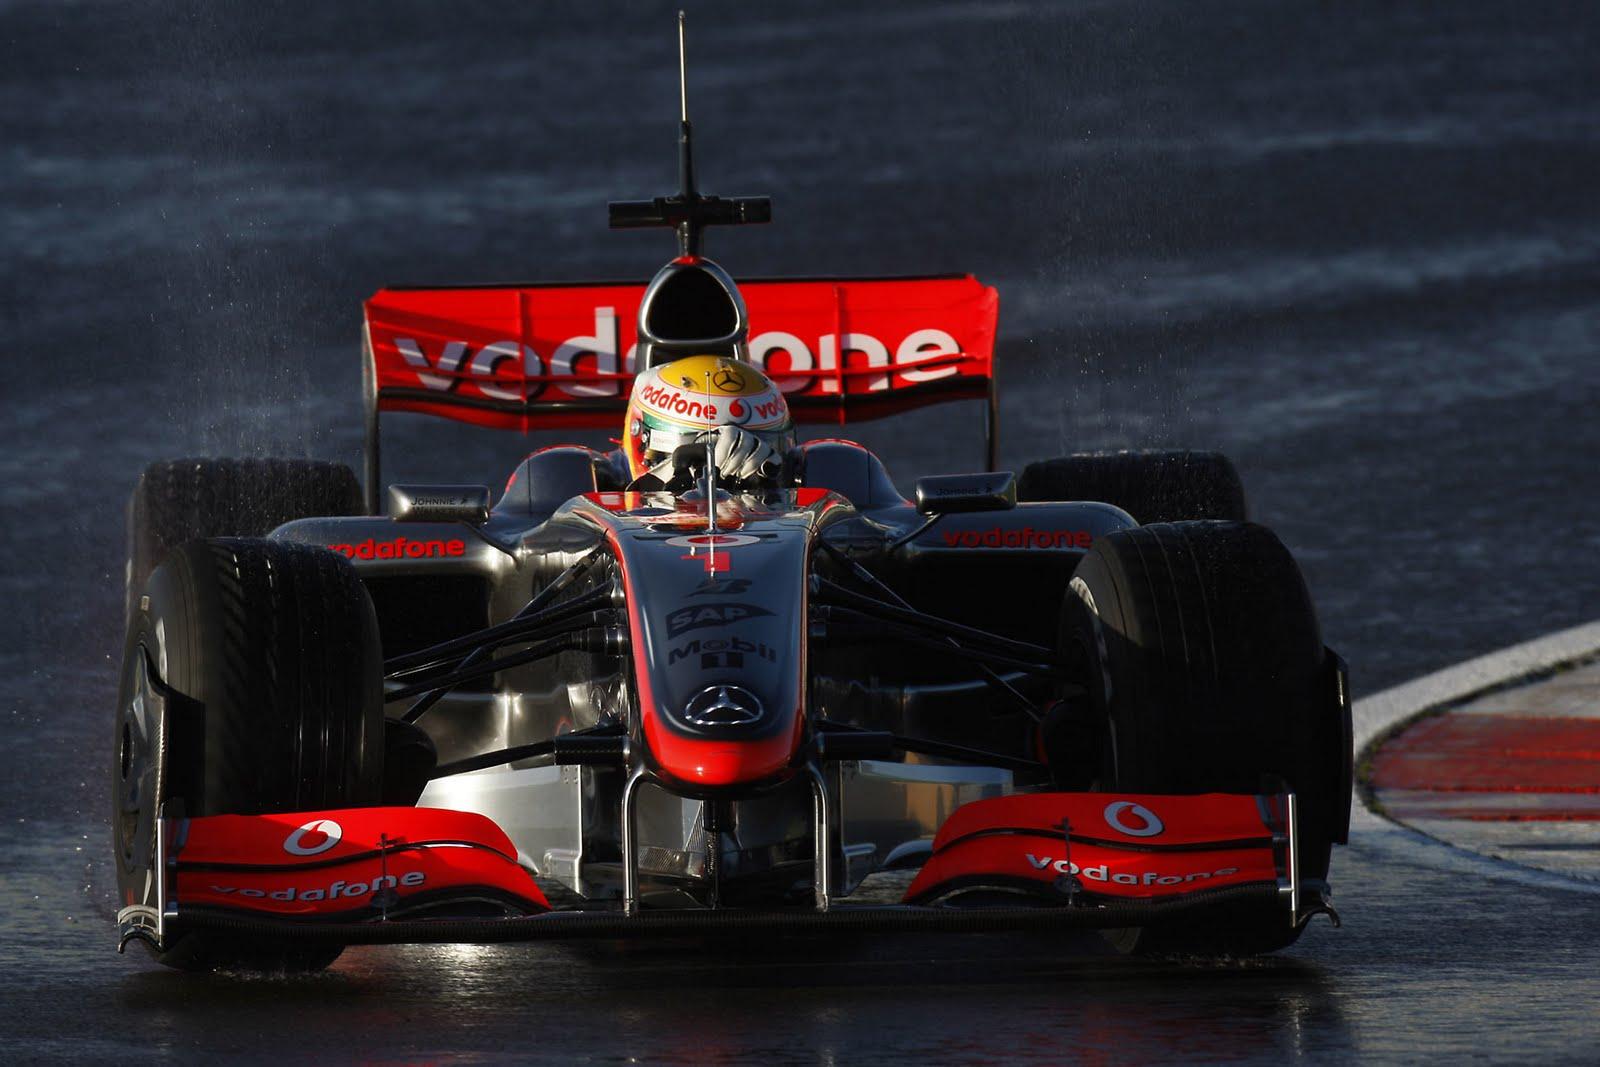 48+ Formula 1 HD Wallpaper Mercedes on WallpaperSafari